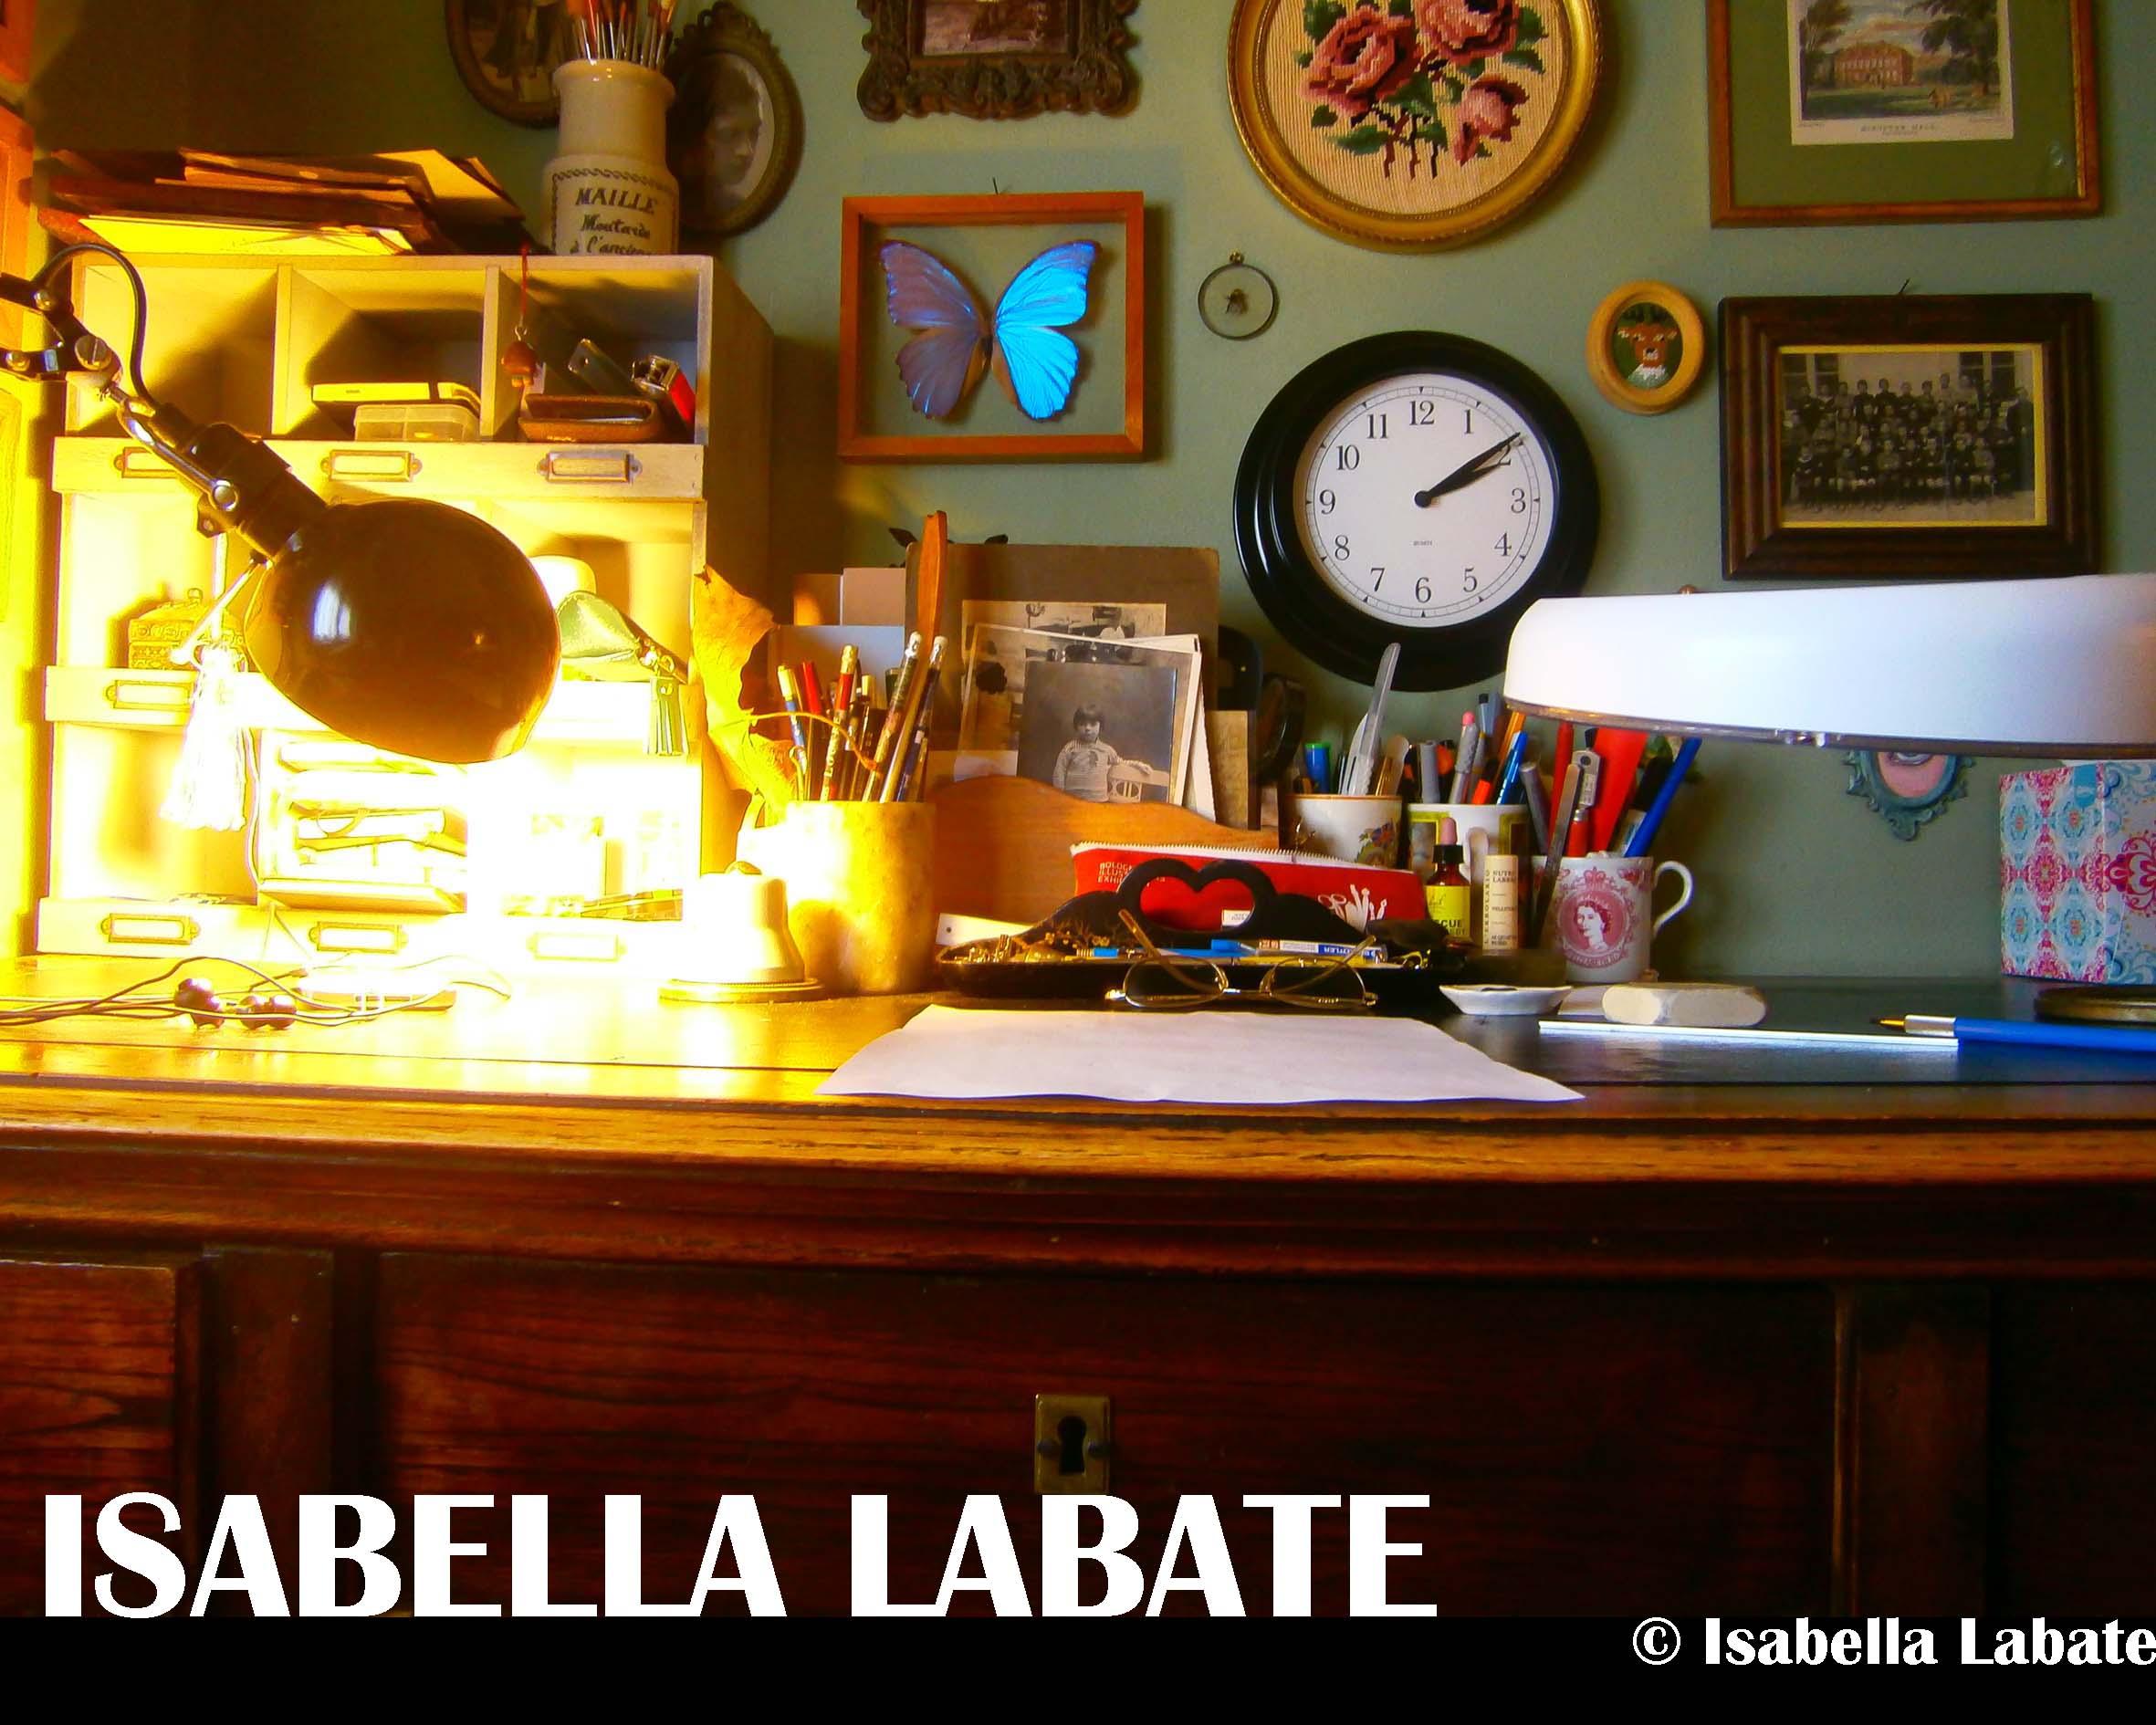 Isabella Labate